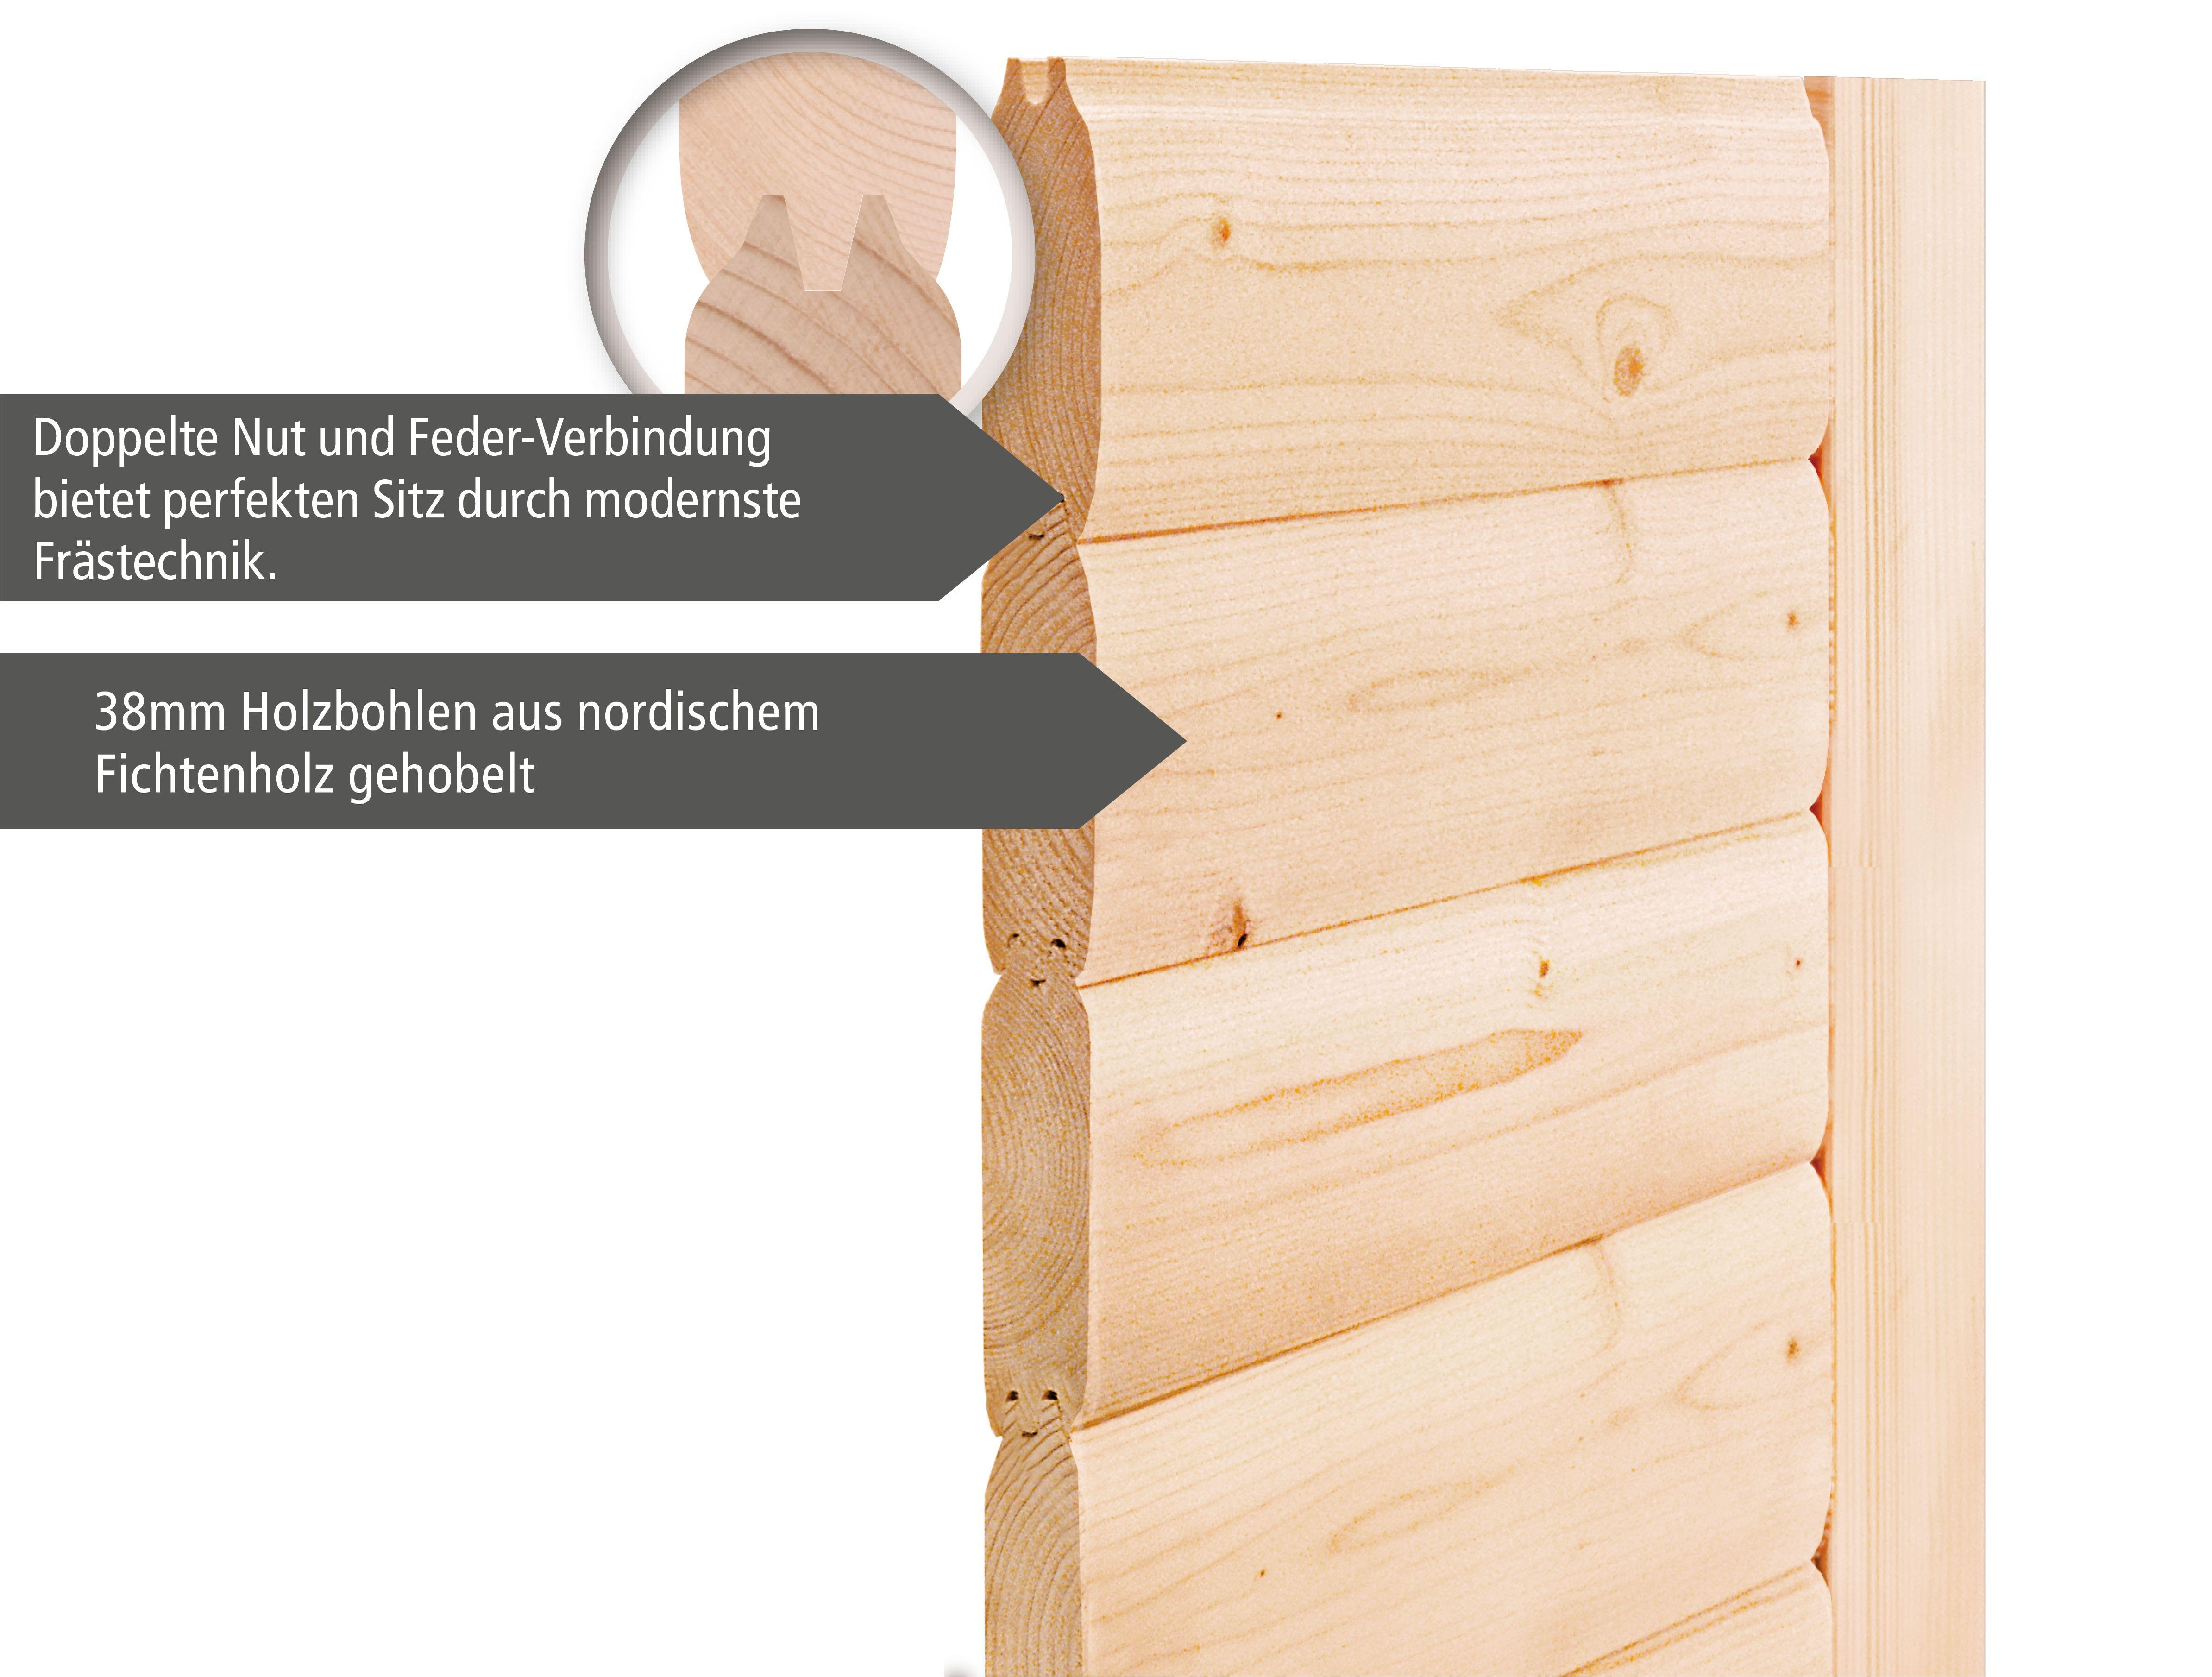 Woodfeeling Sauna Jutta 38mm ohne Saunaofen Bild 9